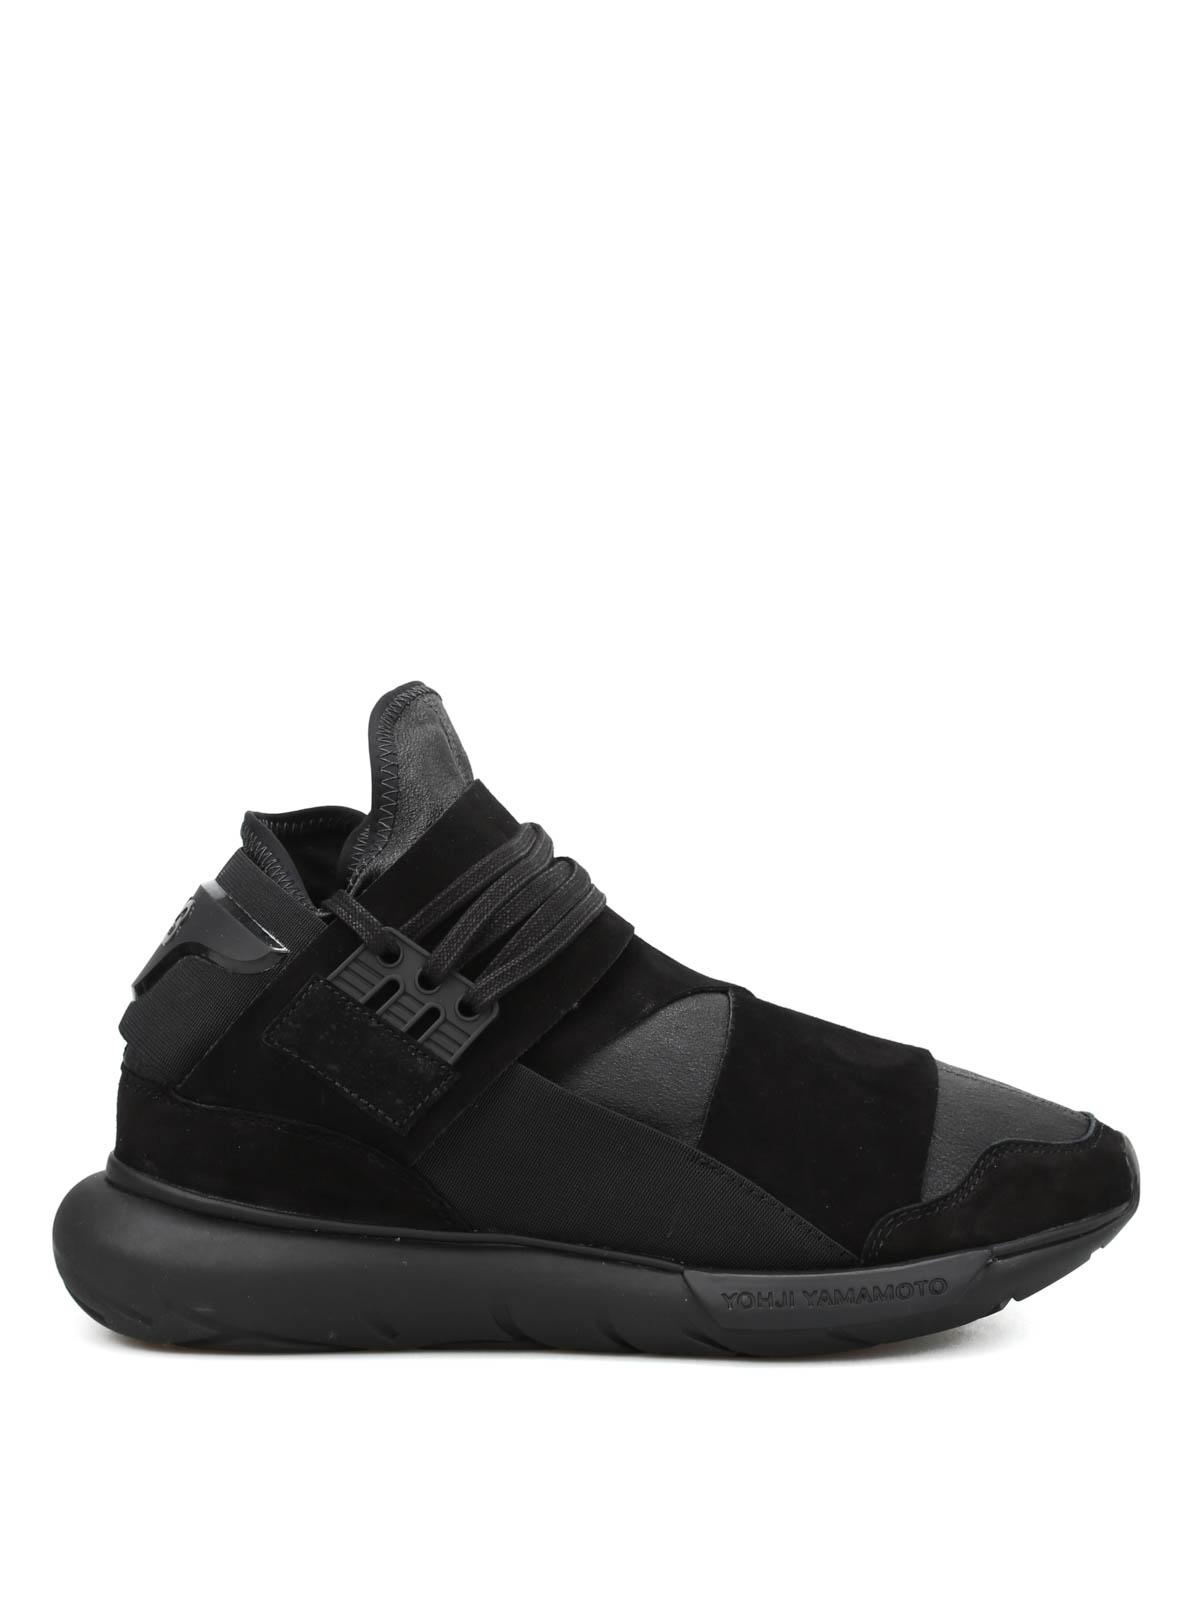 c2ee64e73bd1f Adidas Y-3 - Qasa High slip-on sneakers - Sneaker - BB4733